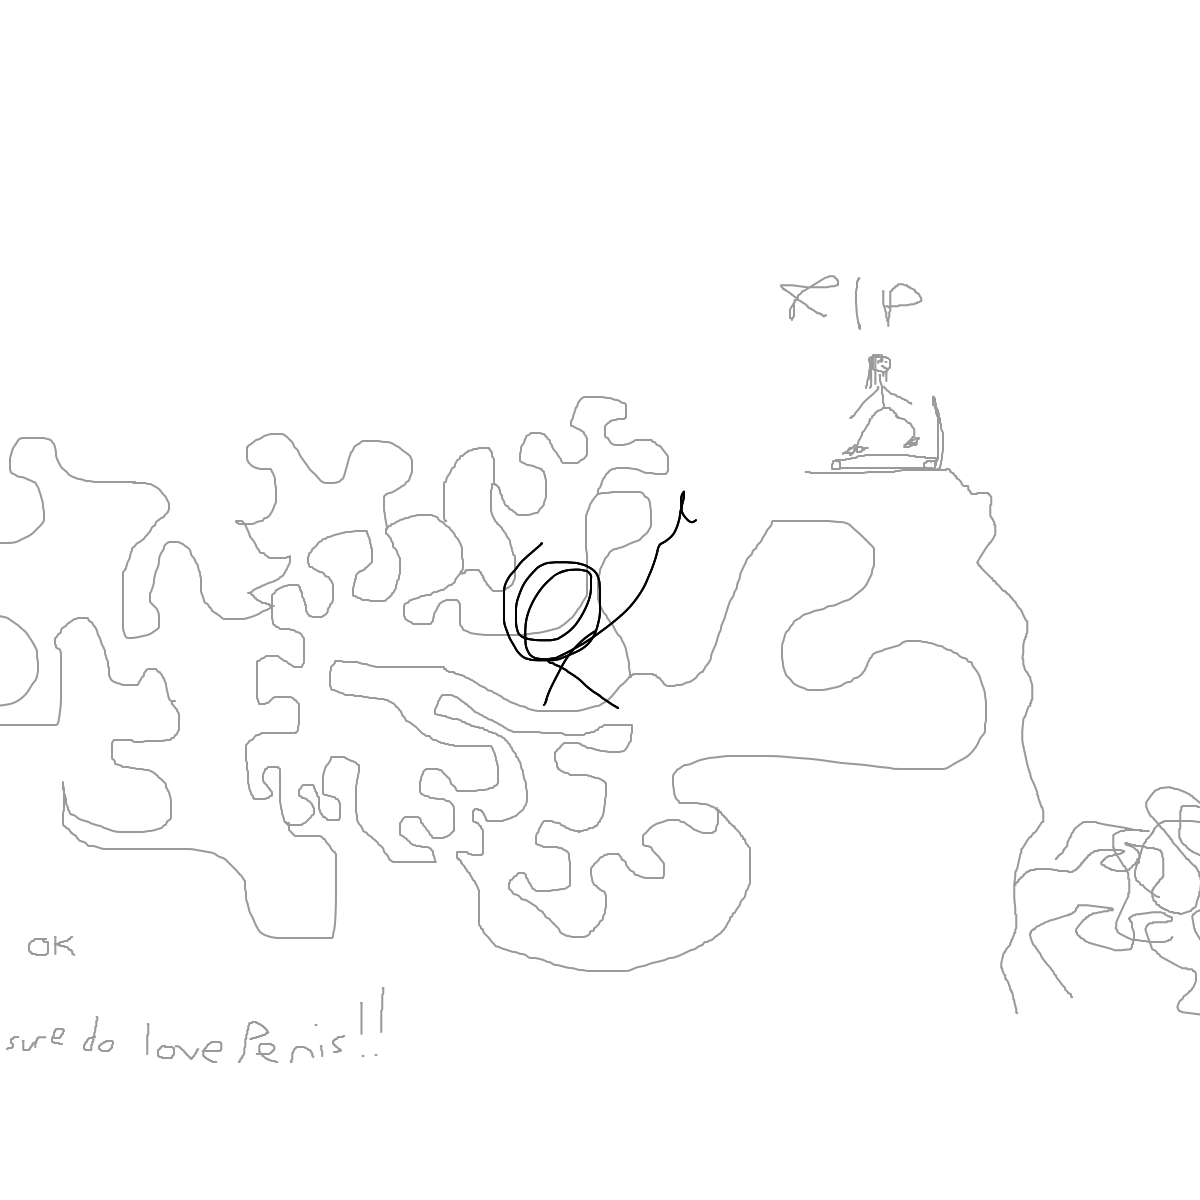 BAAAM drawing#784 lat:44.4774284362793000lng: -76.6932373046875000